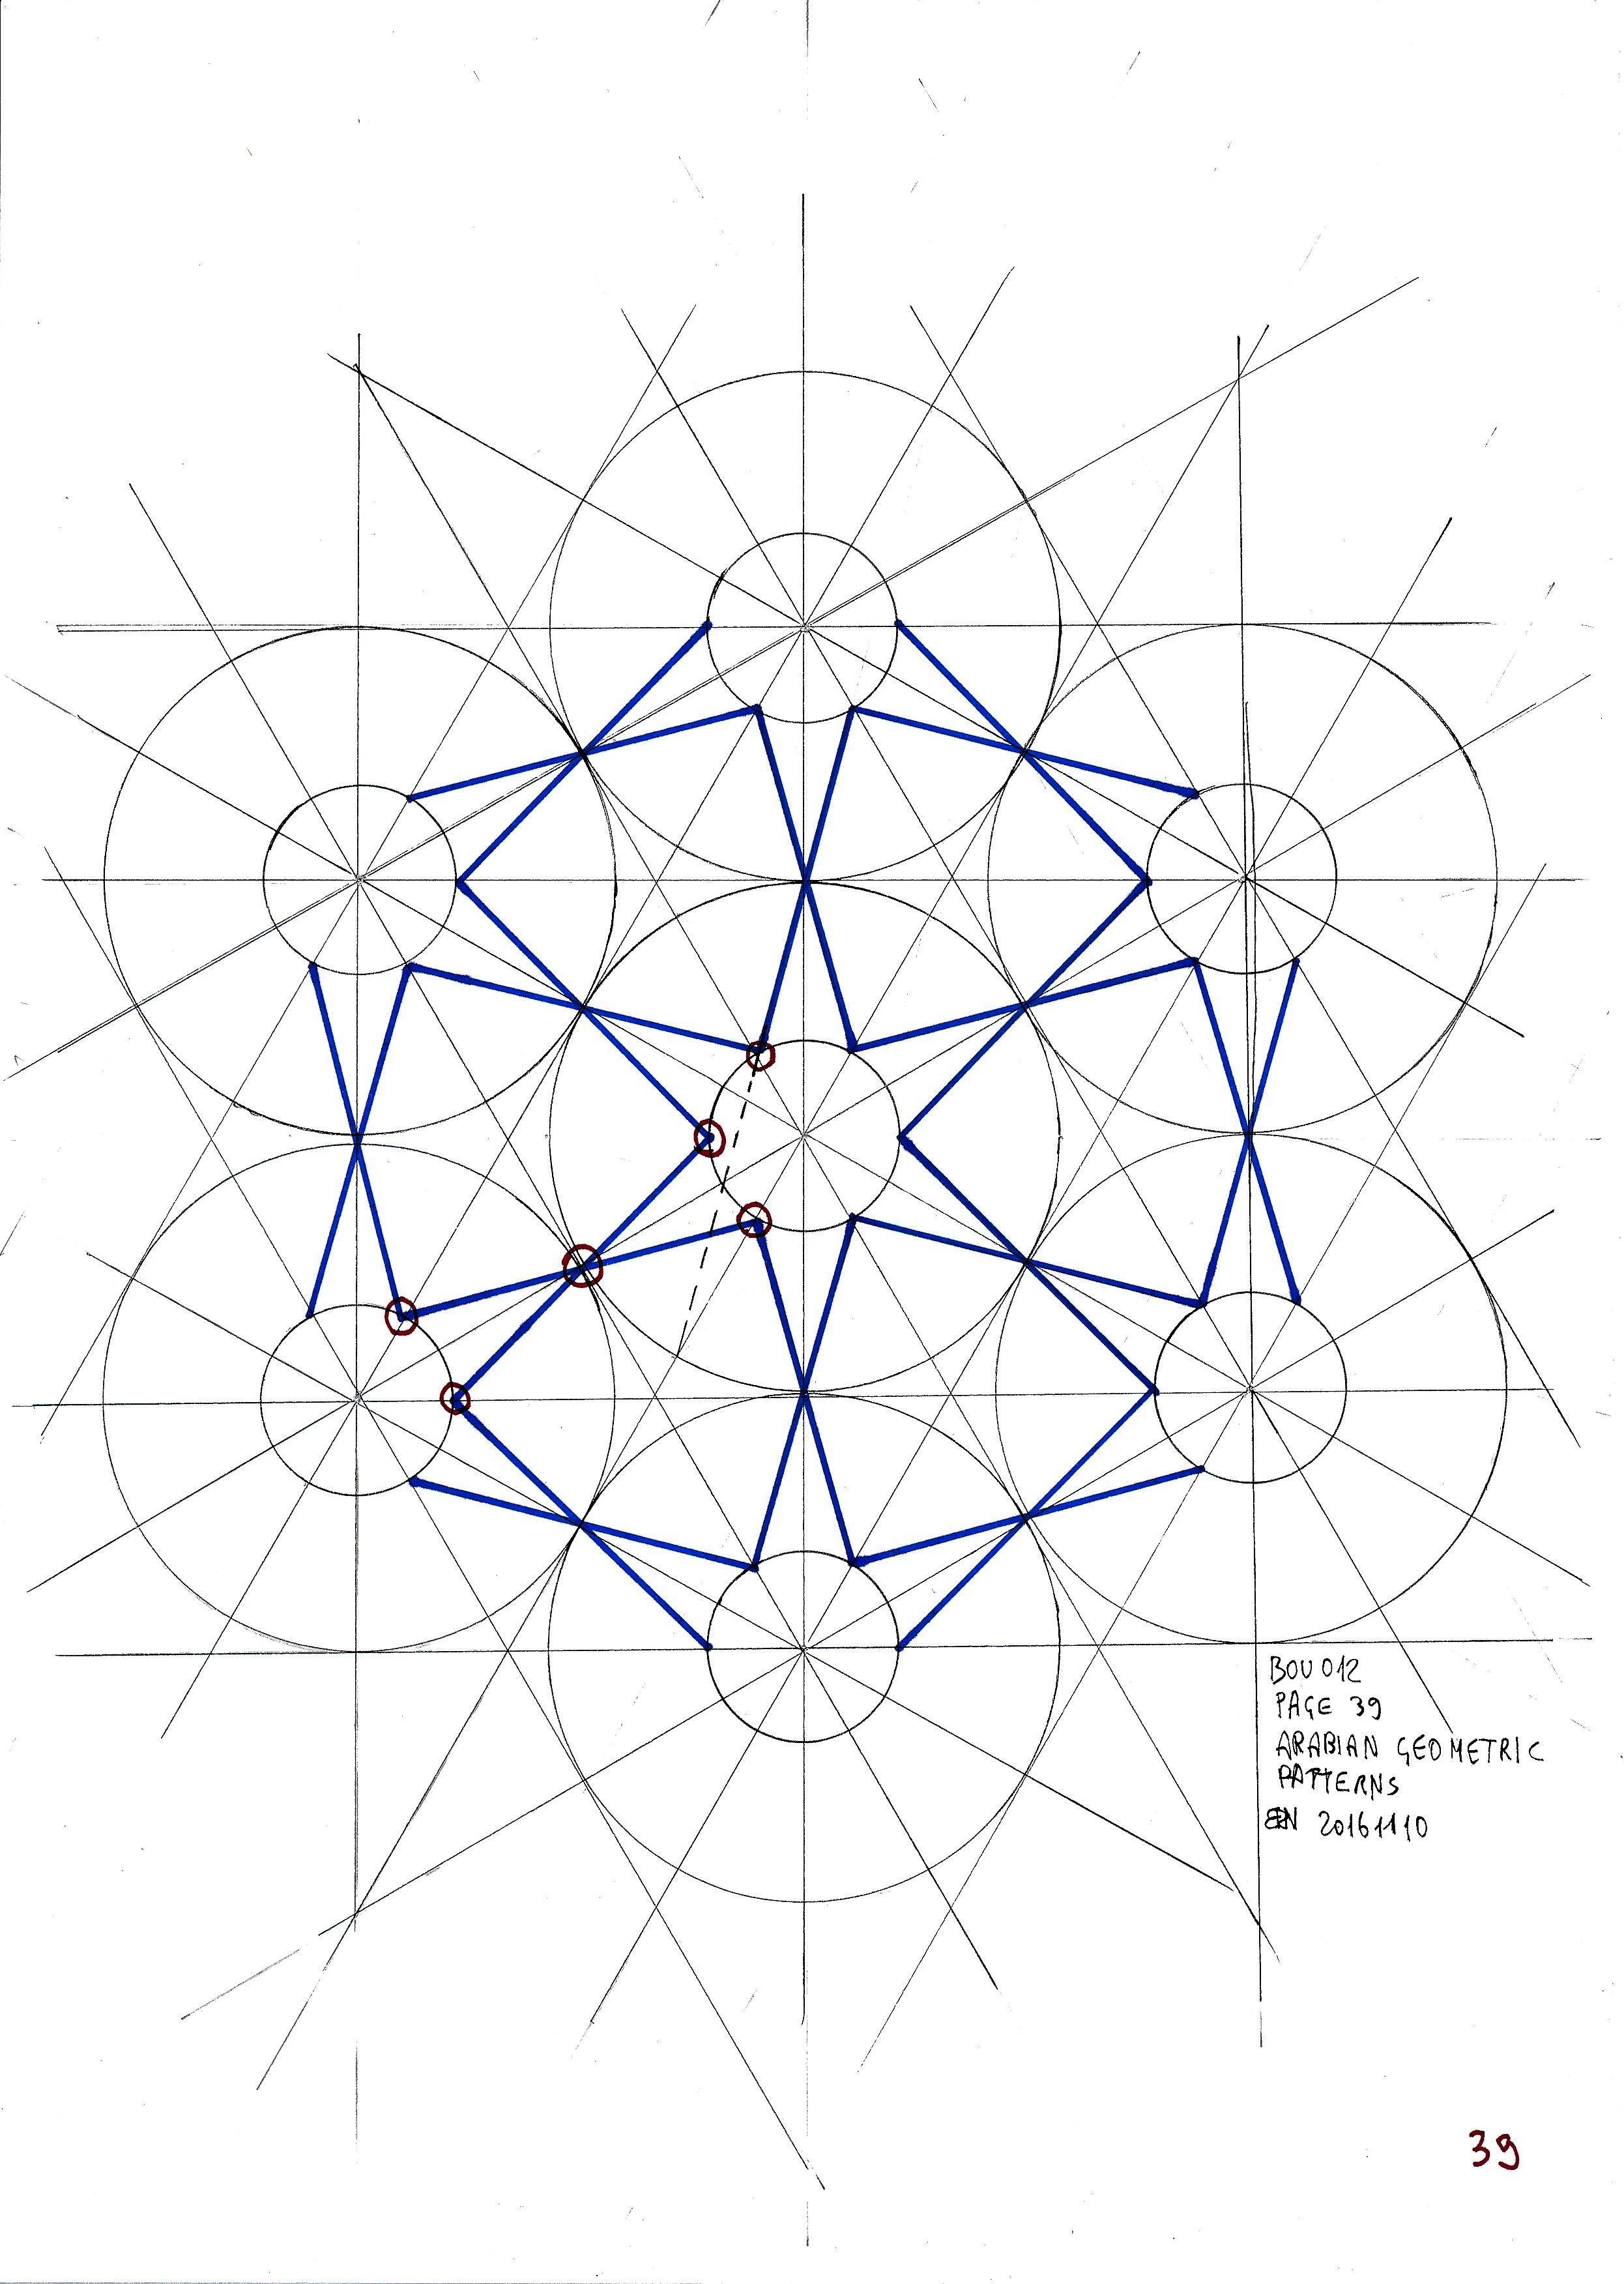 Bou012 Islamicdesign Islamicpattern Islamicart Arabiangeometry